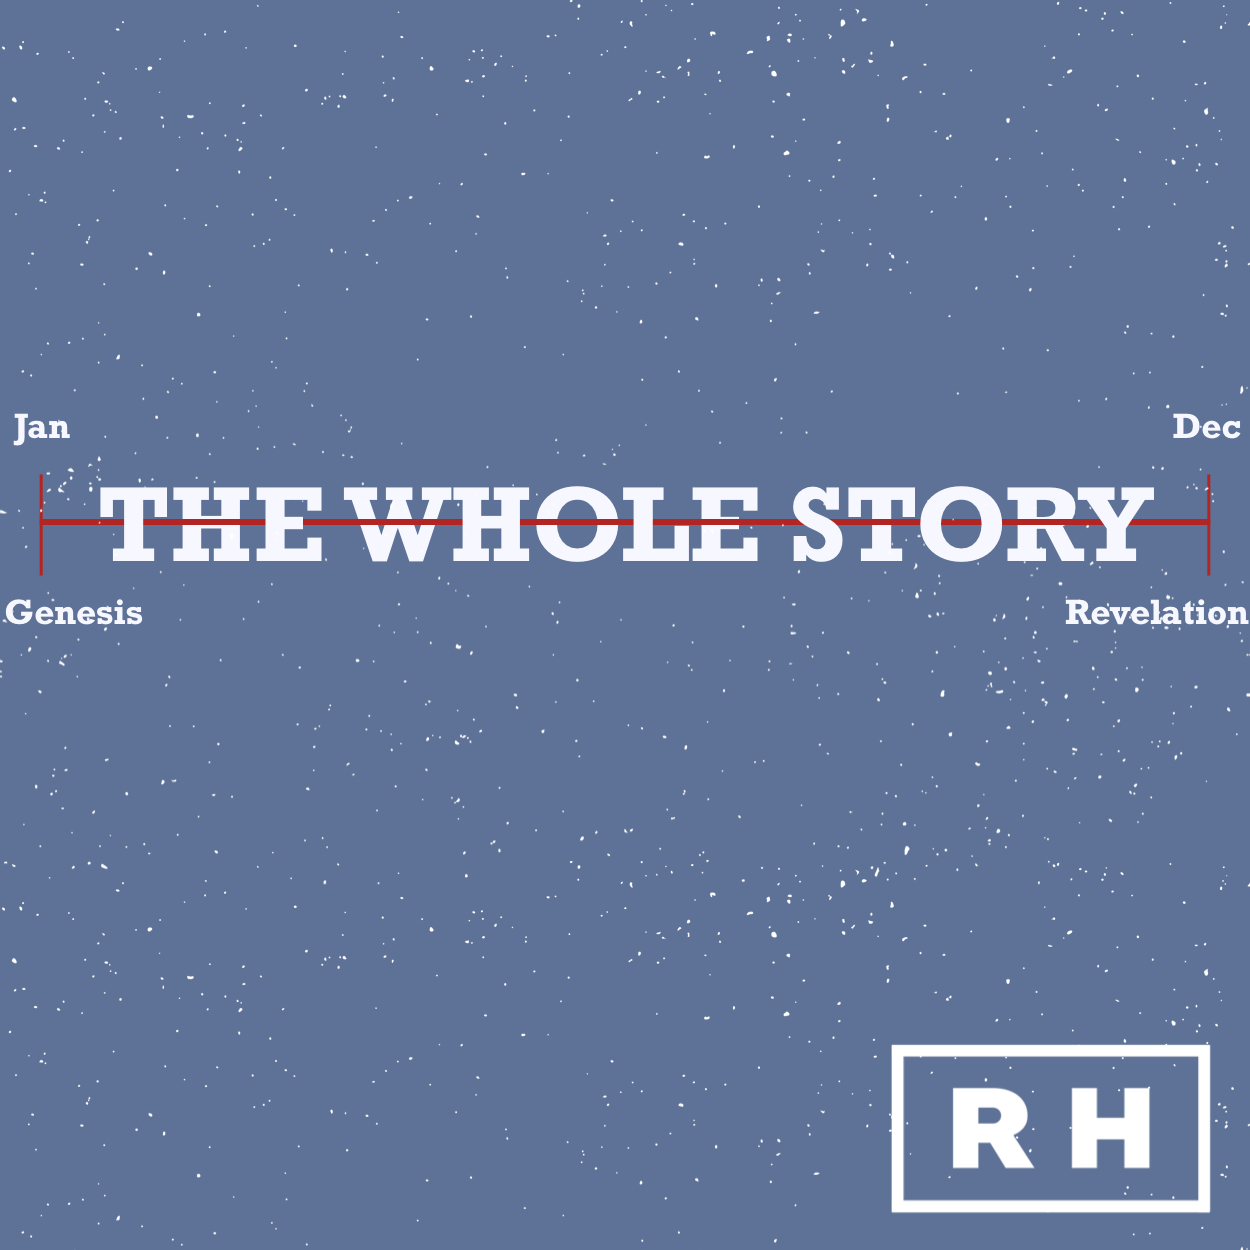 You had one job: the story of Deborah, the one decent judge - Robert Frazier